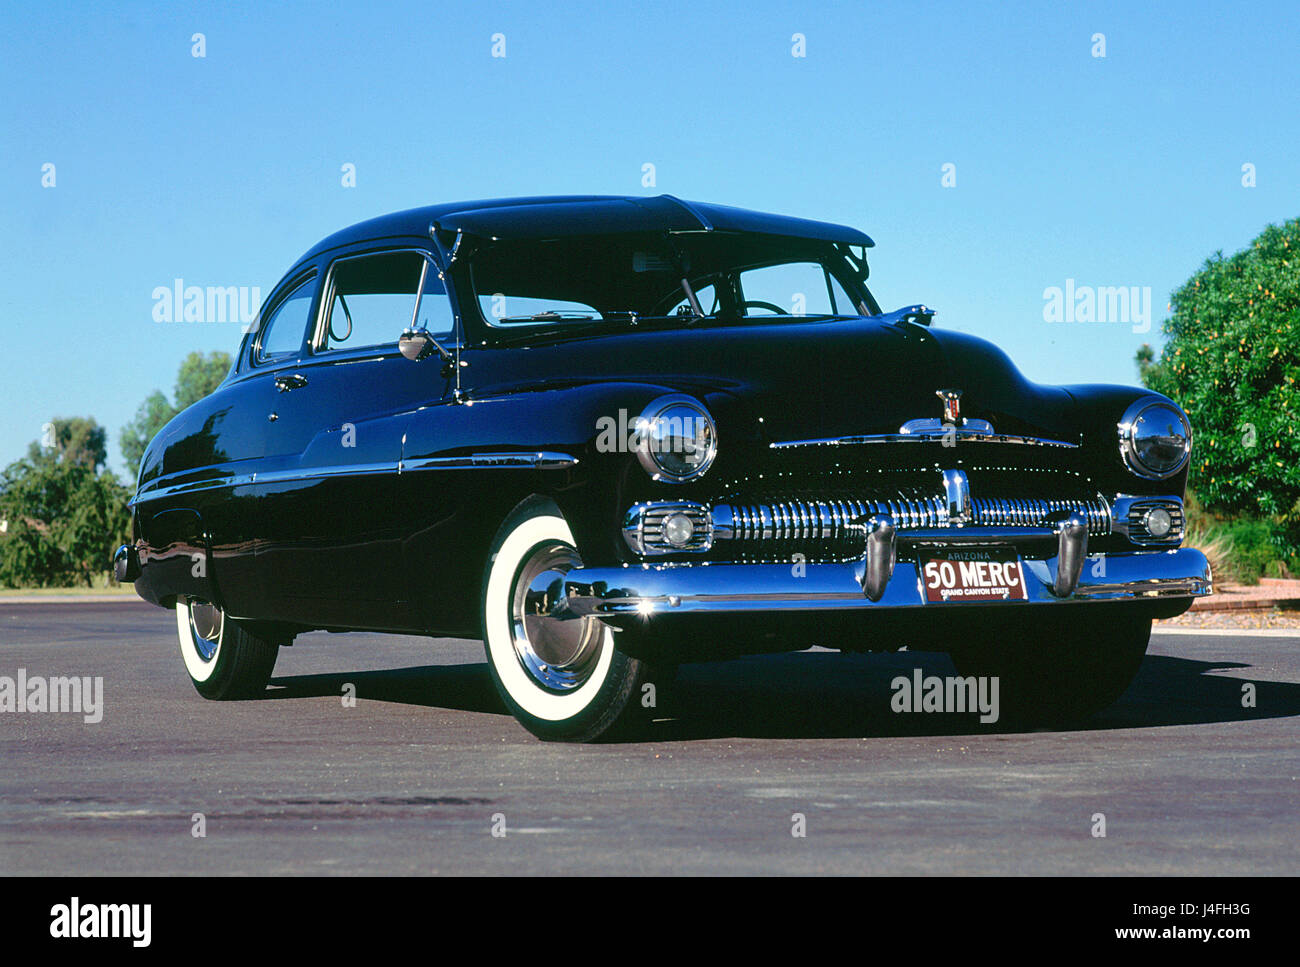 1950 Mercury Coupe Stockfoto Bild 140484276 Alamy